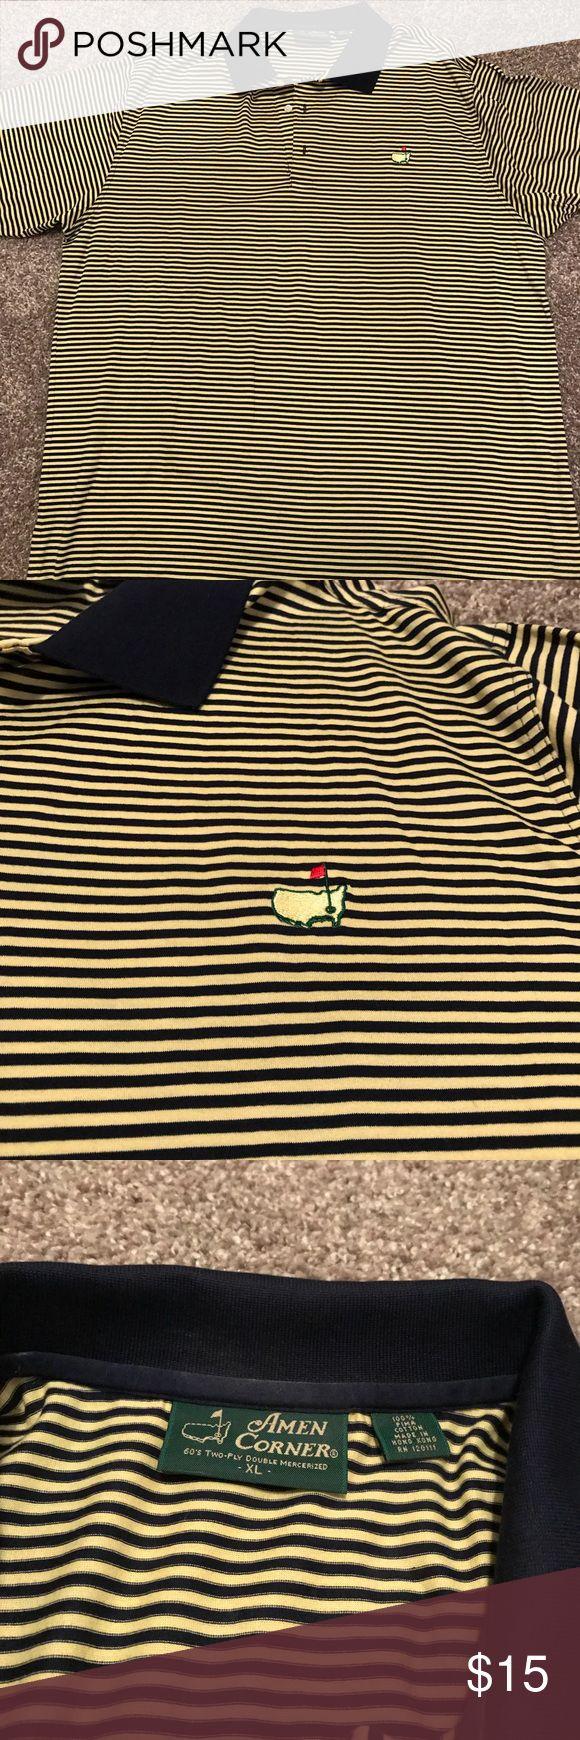 Amen Corner Golf Polo Shirt Crisp clean condition great for that die hard golfer amen corner Shirts Polos